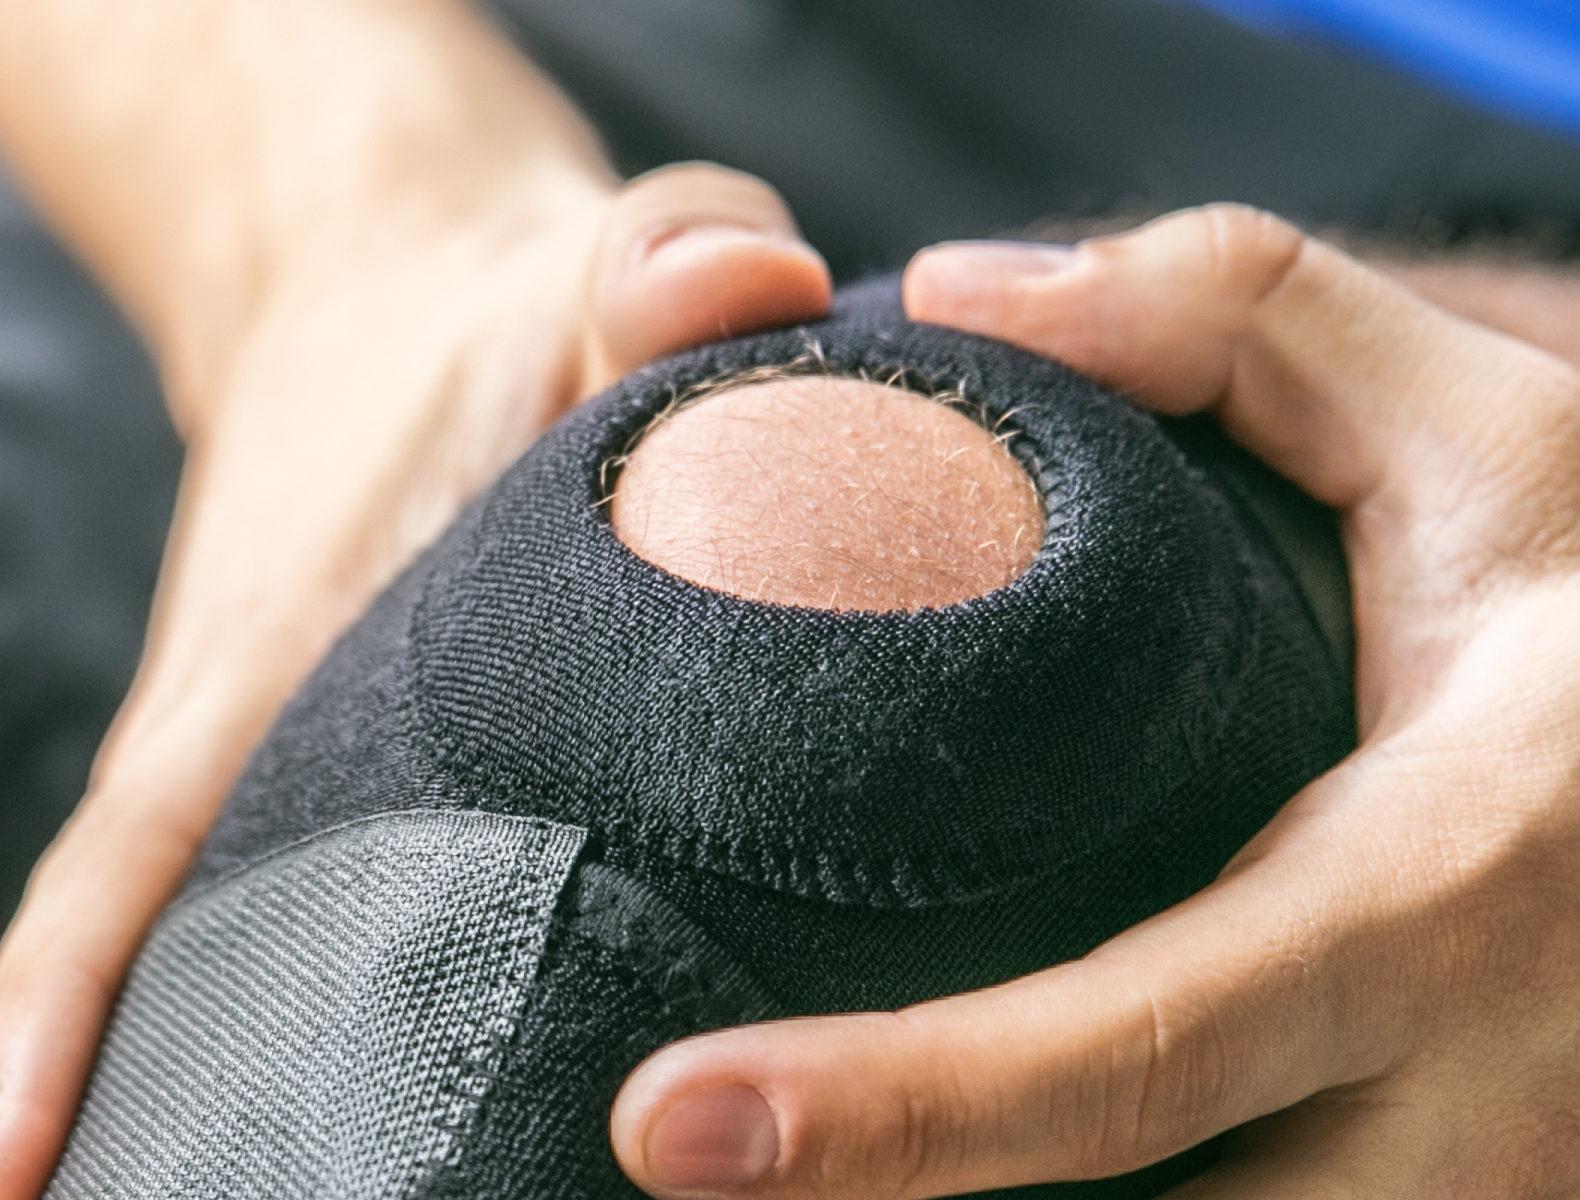 Sports injuries, bandaged knee